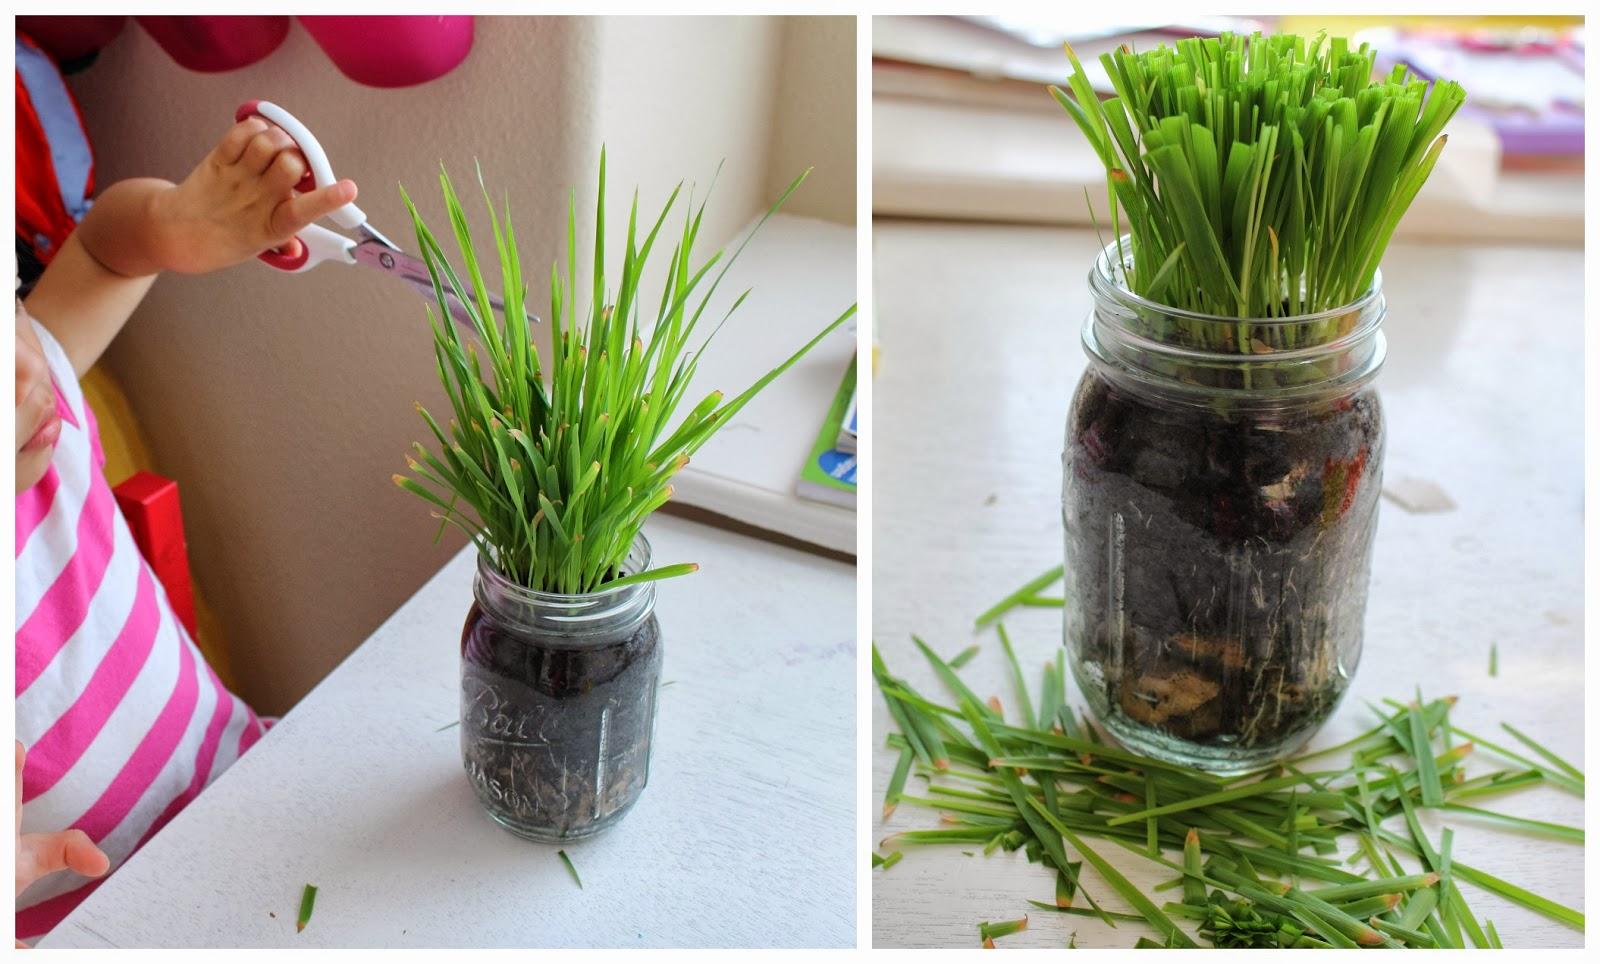 minecraft how to make grass grow